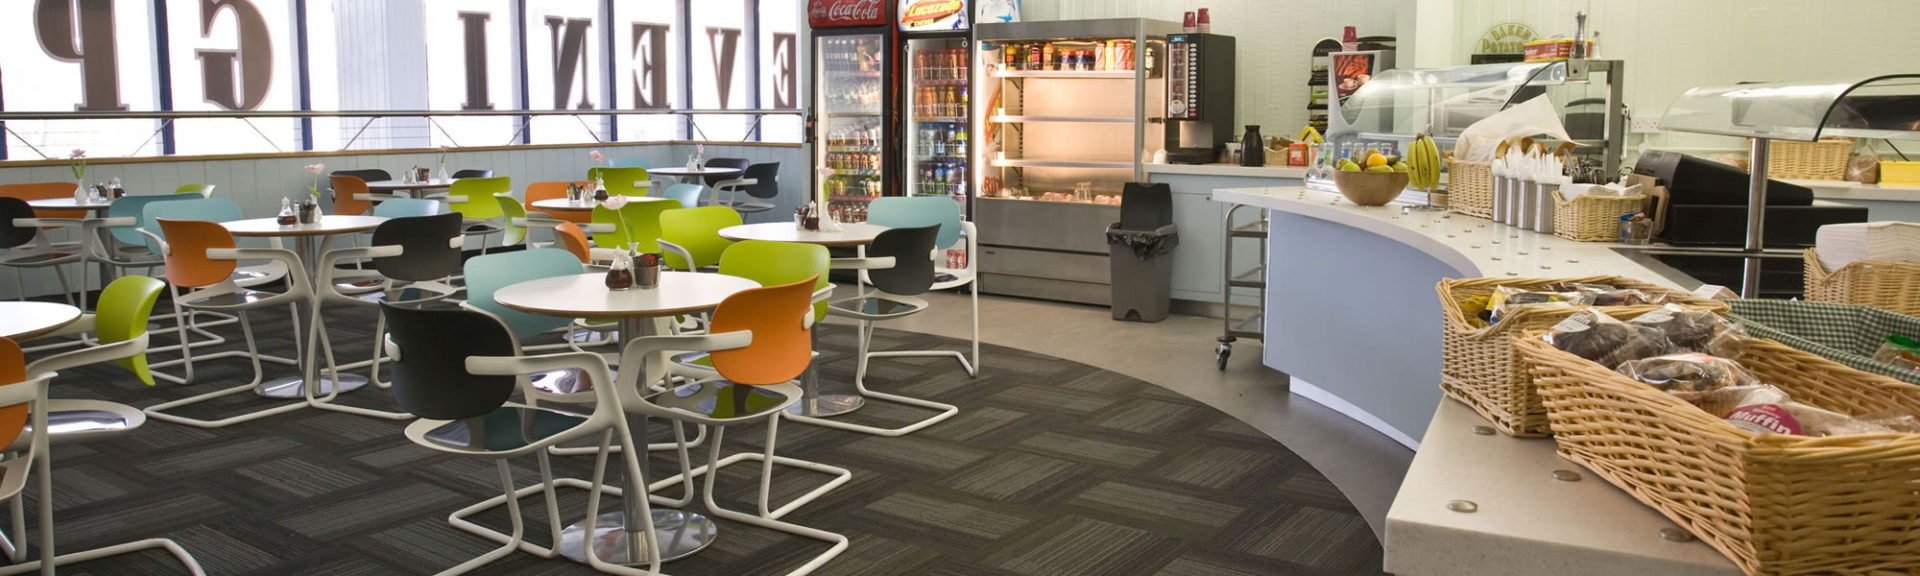 banner-commercial-kitchen-furniture